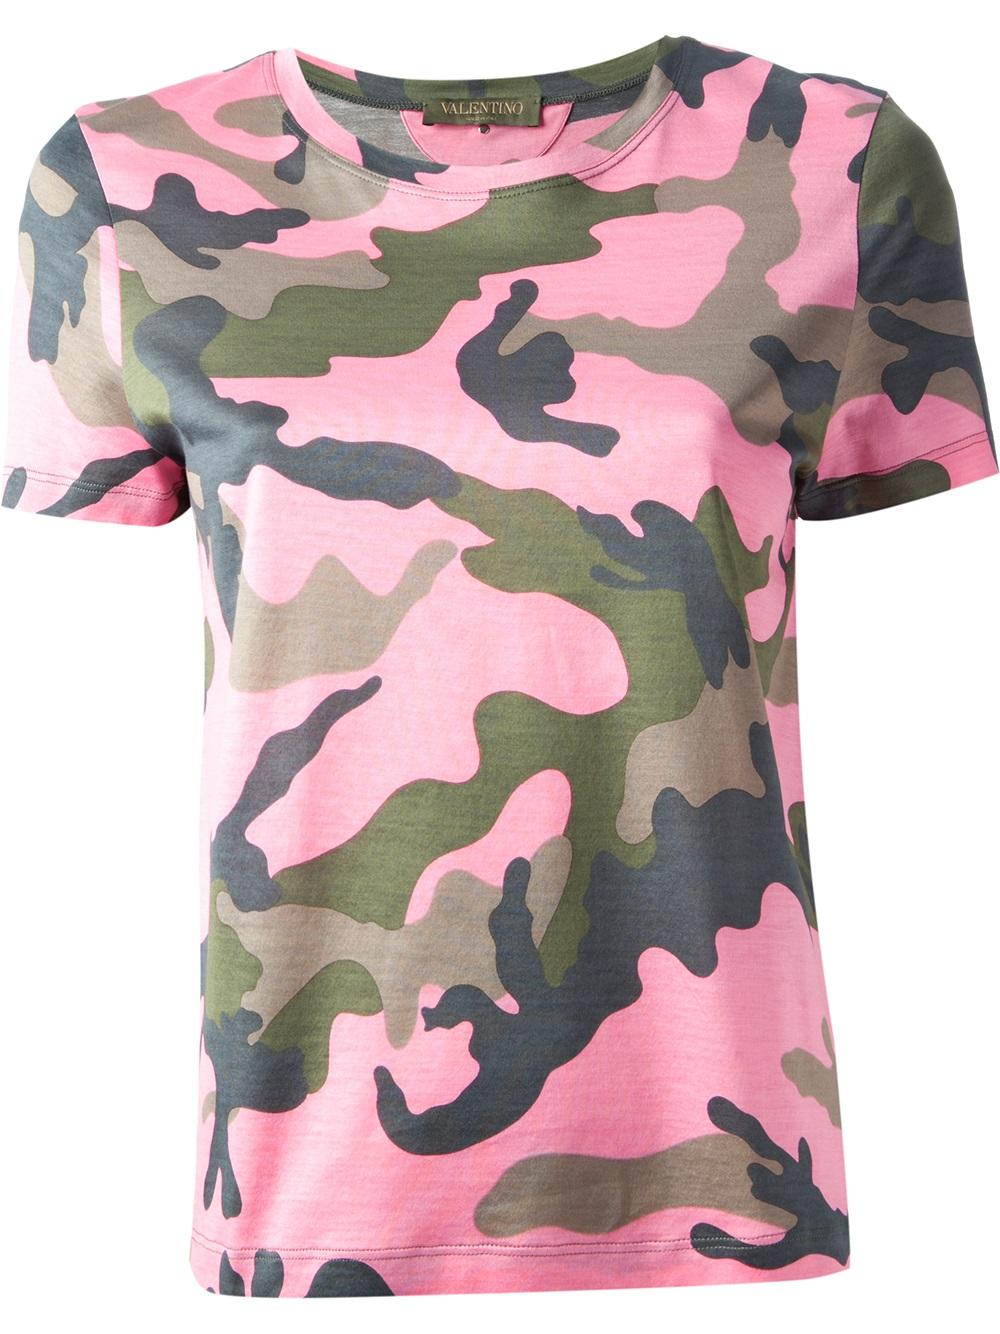 e62895fb277b Valentino pink purple camouflage print tshirt product jpg 1000x1334 Pink  camo shirts for women